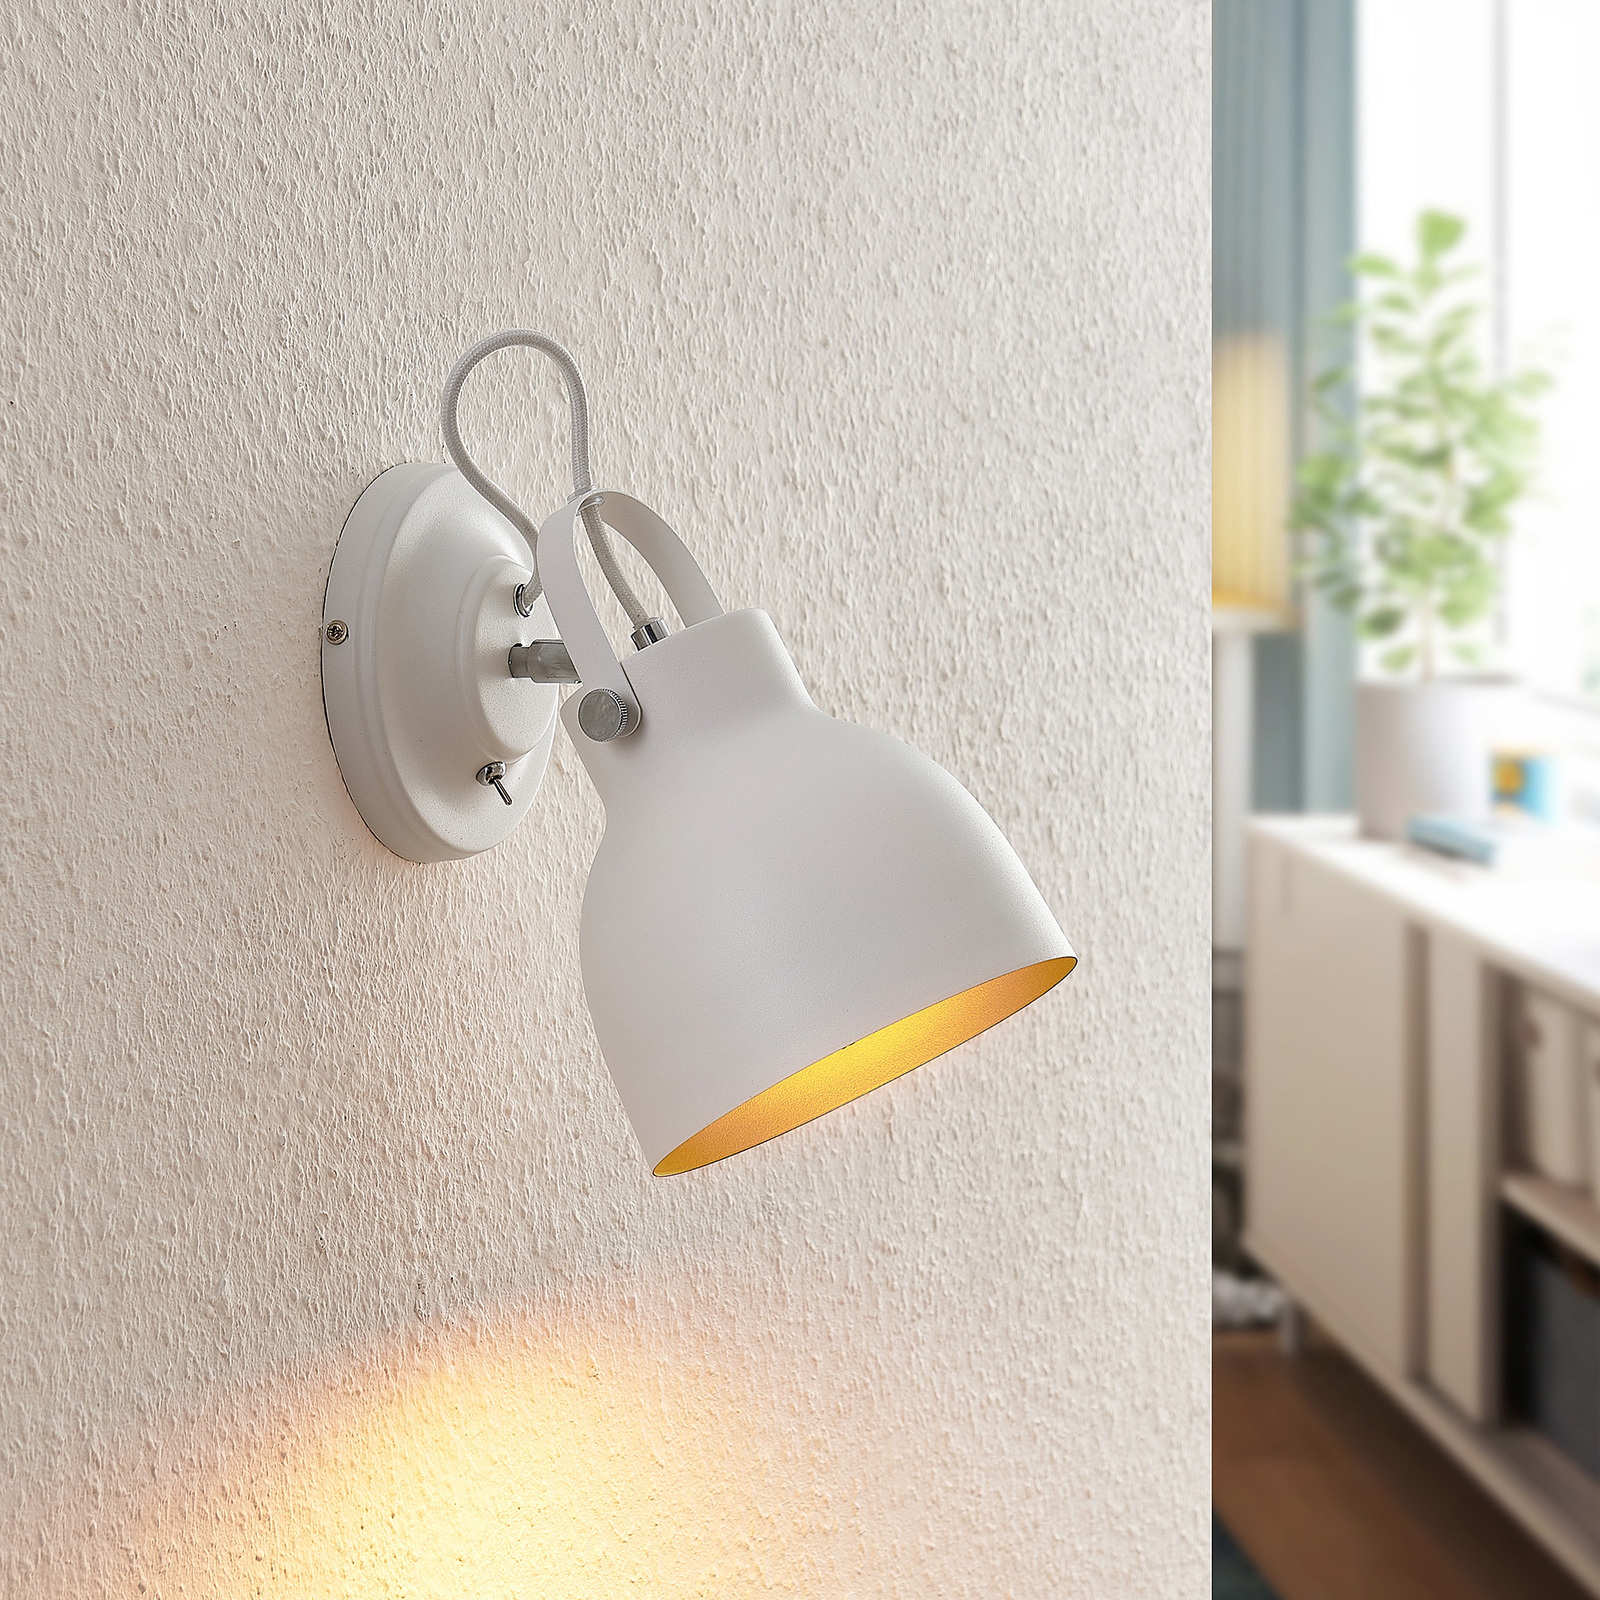 Lindby Adirta metalen wandlamp in wit